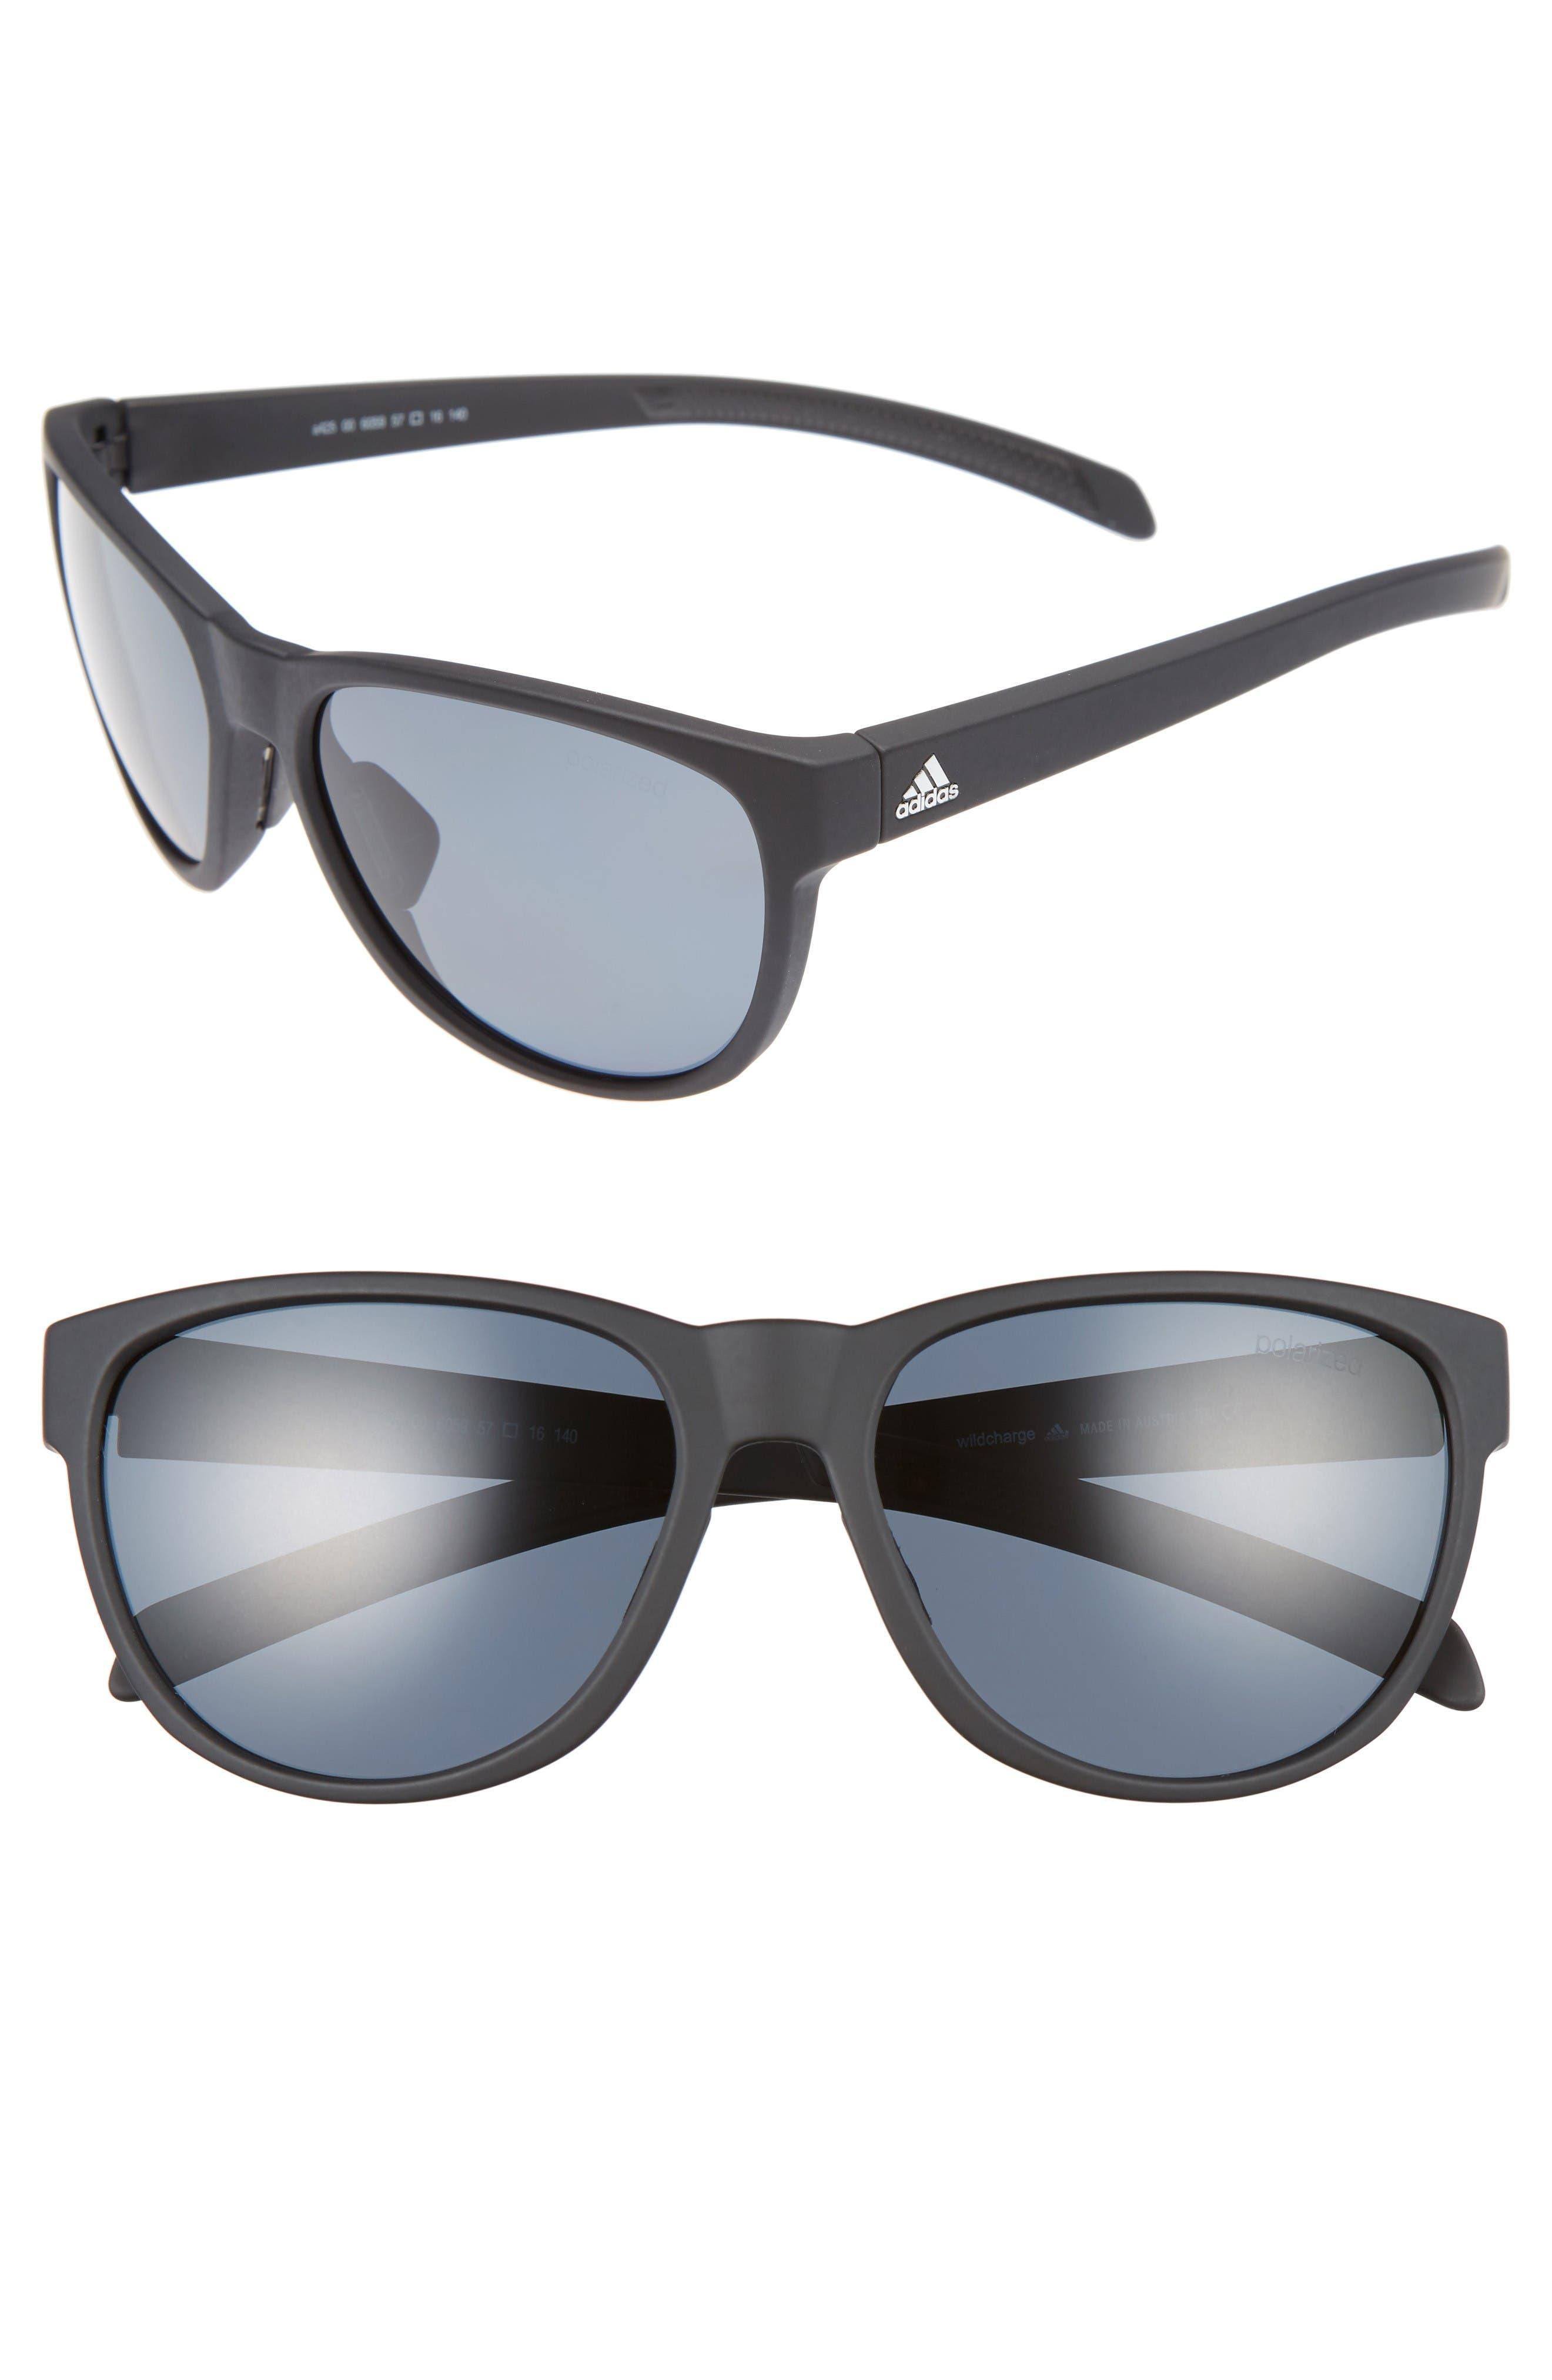 Wildcharge 61mm Polarized Sunglasses,                         Main,                         color, Black Matte/ Grey Polar